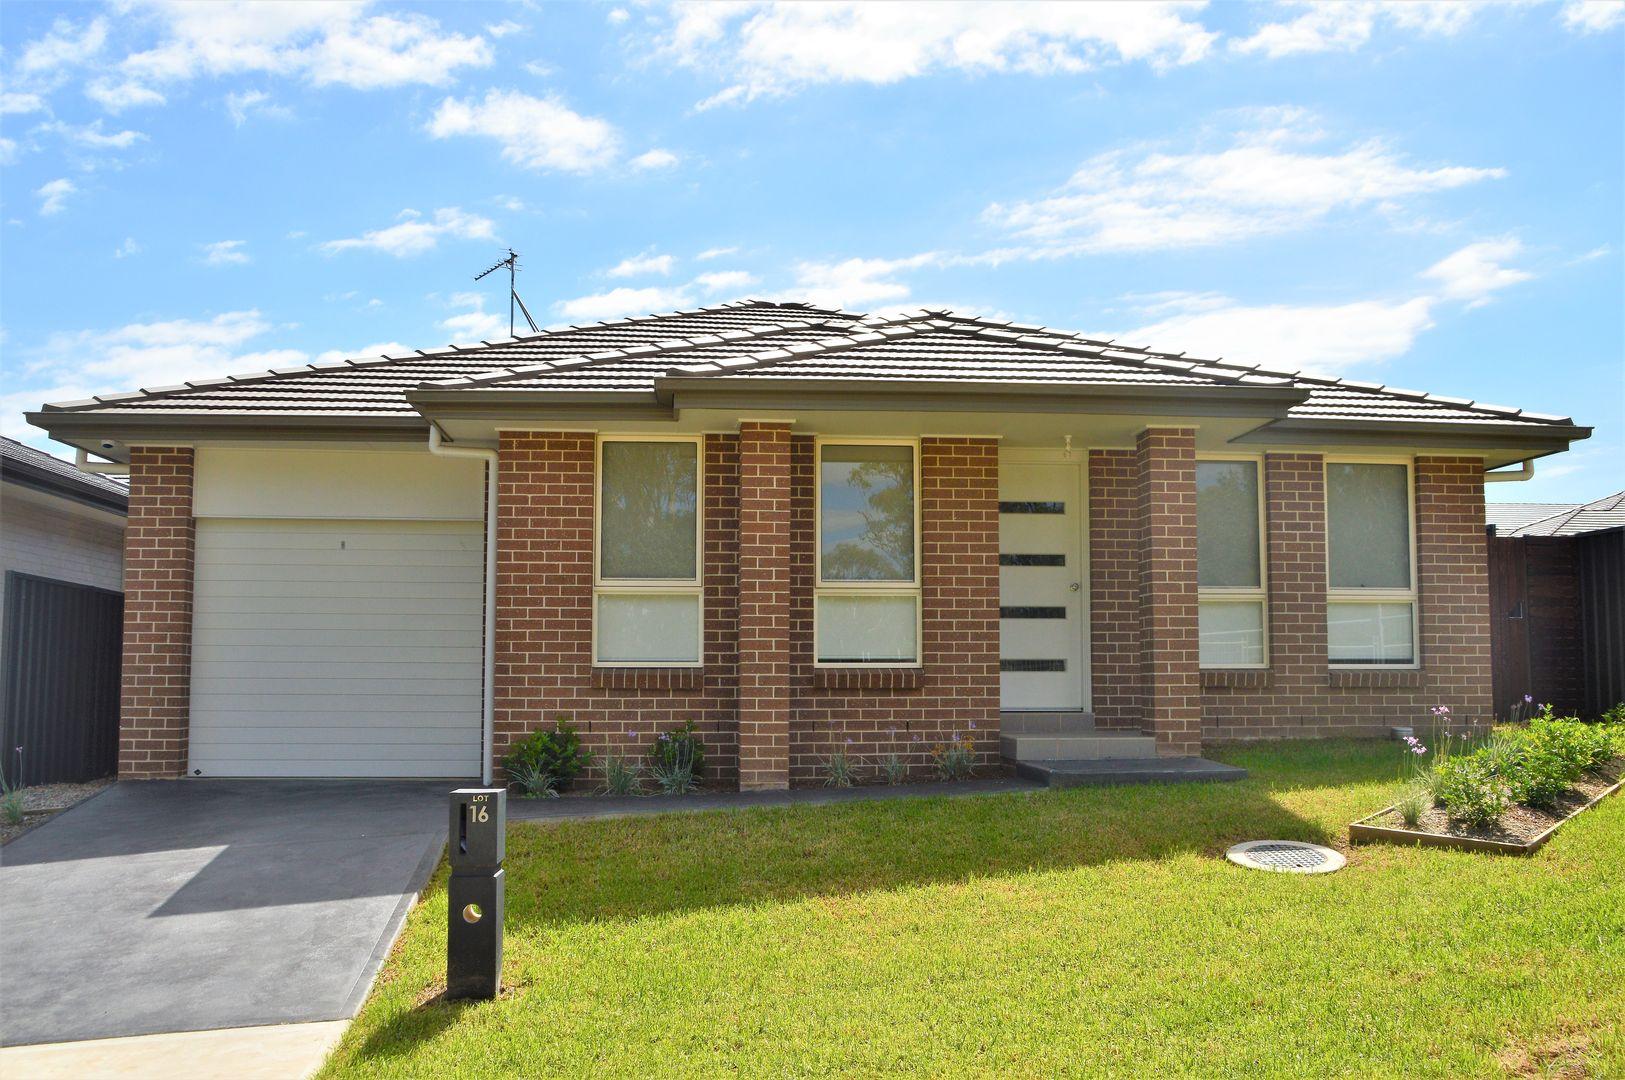 16 Resh Avenue, Riverstone NSW 2765, Image 0